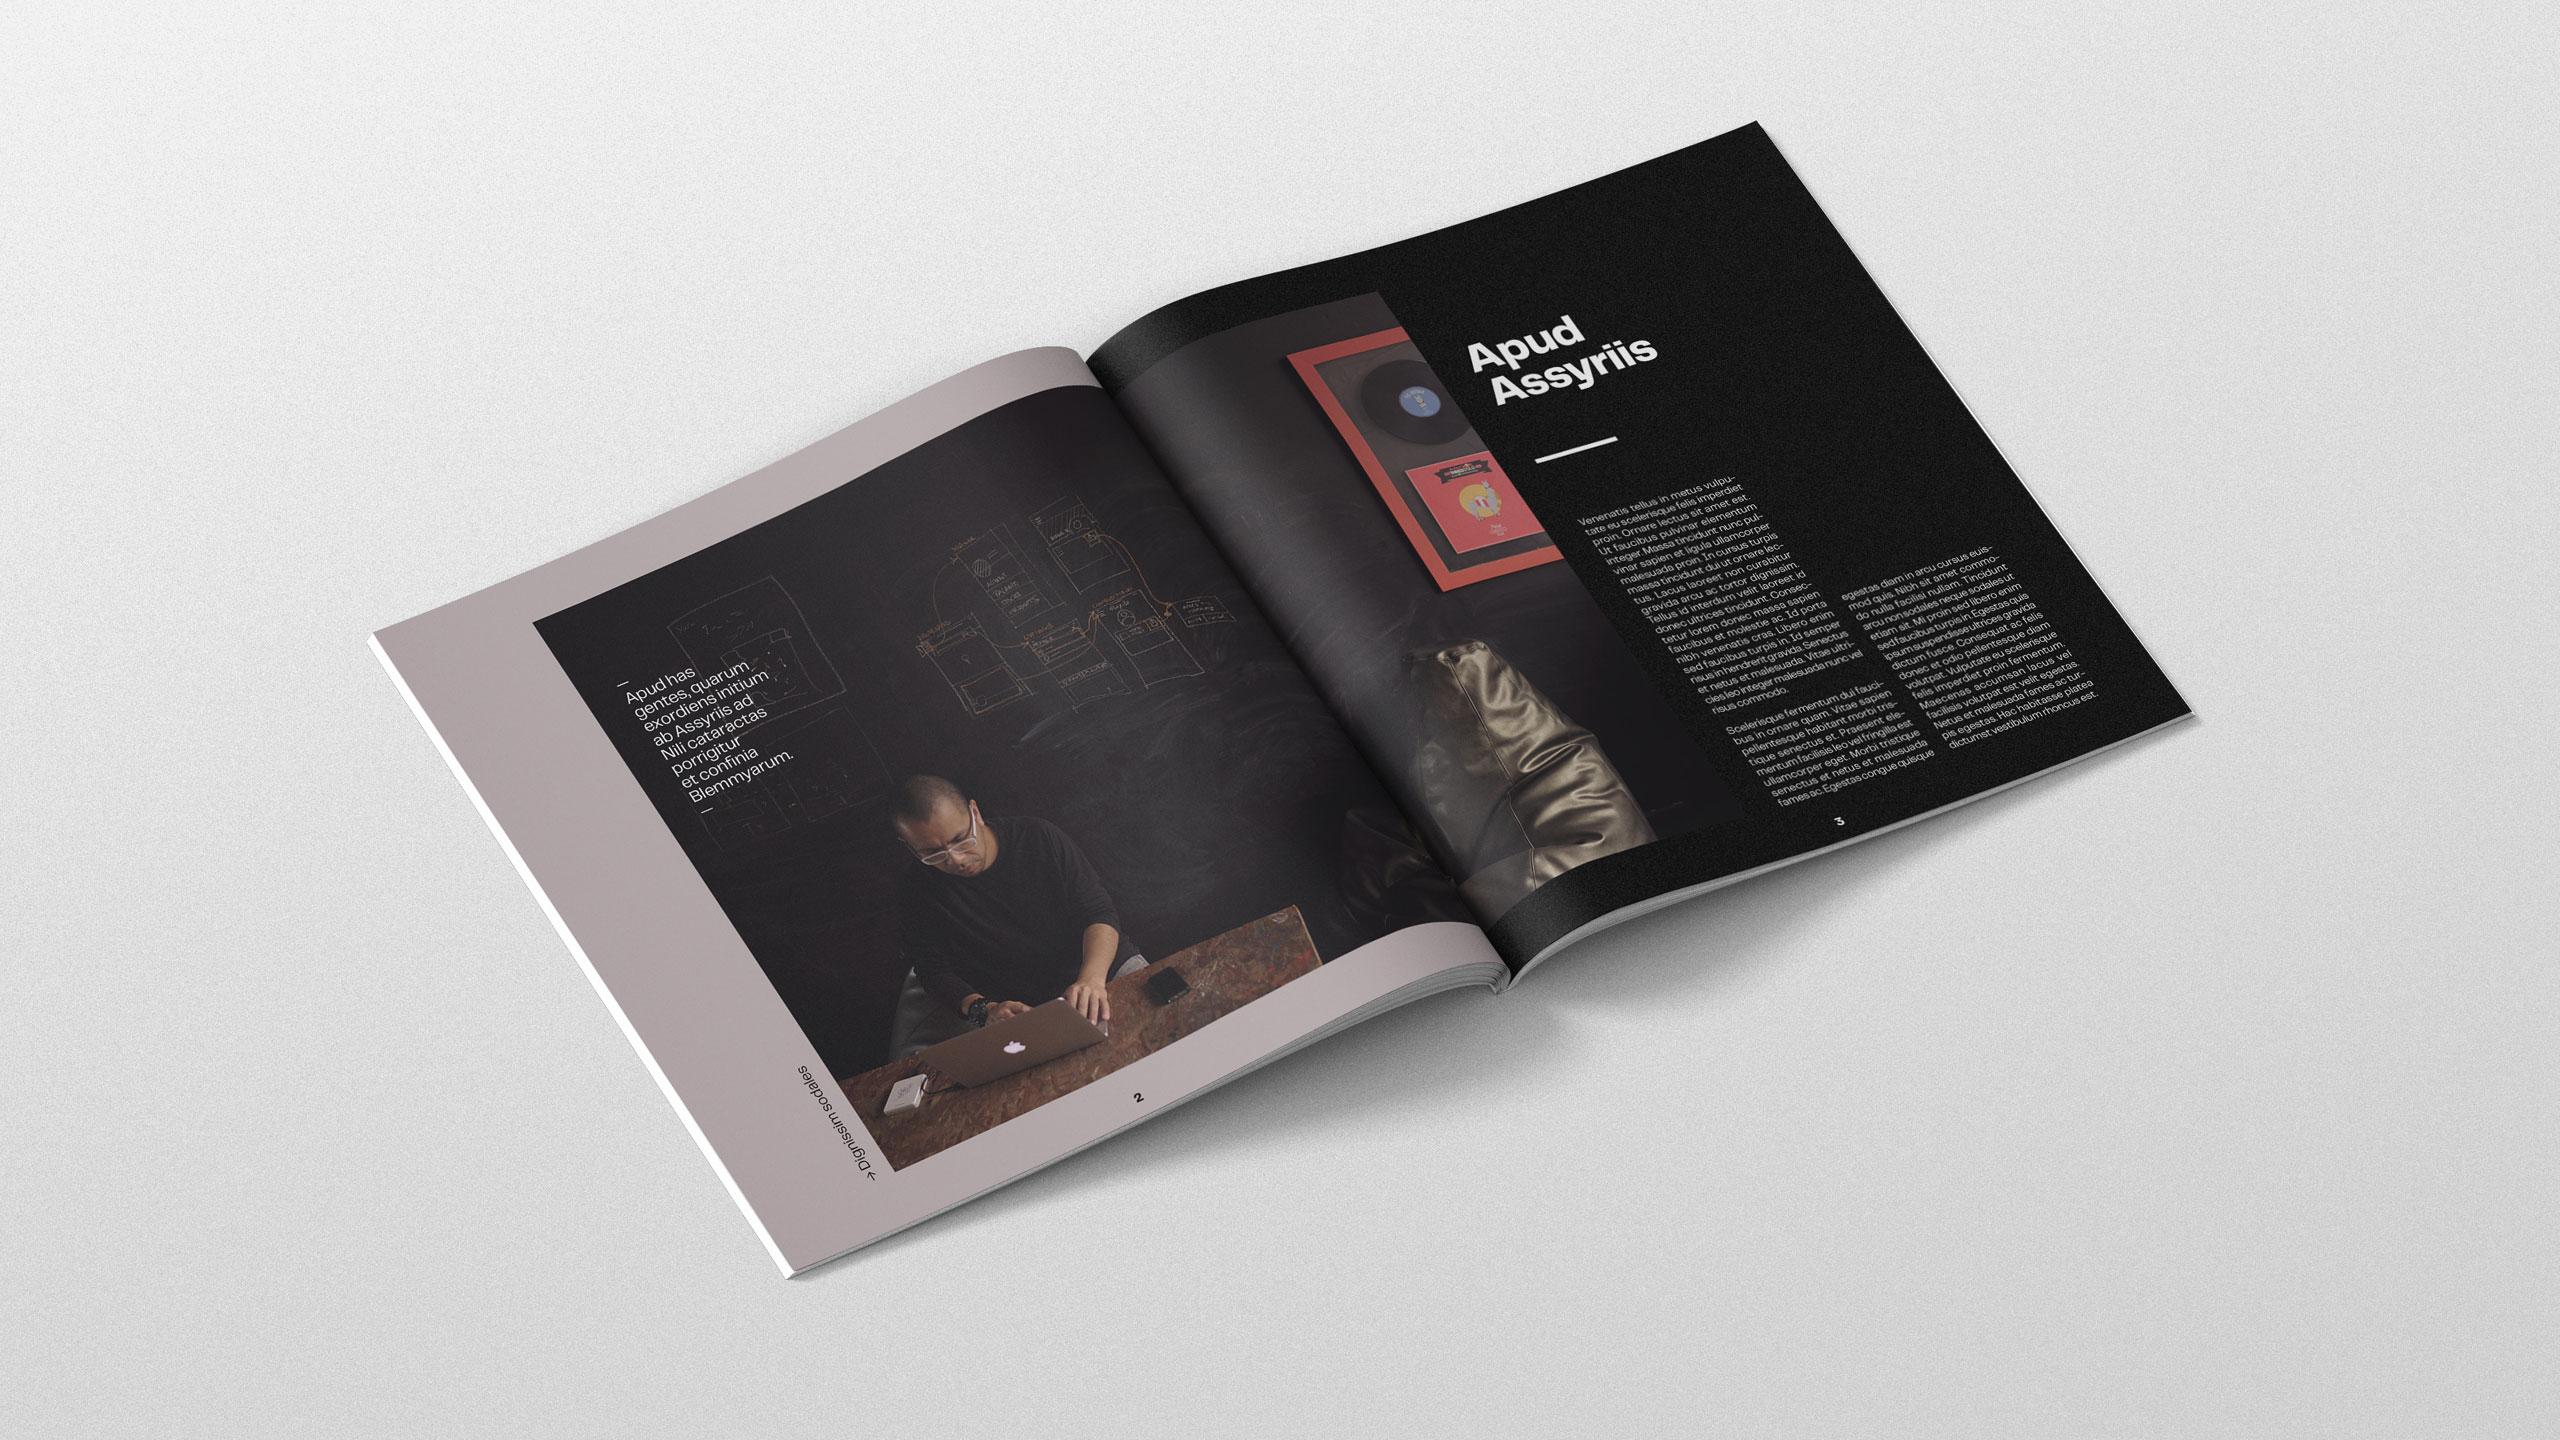 antoine-cornou-book-inside-editorial-design